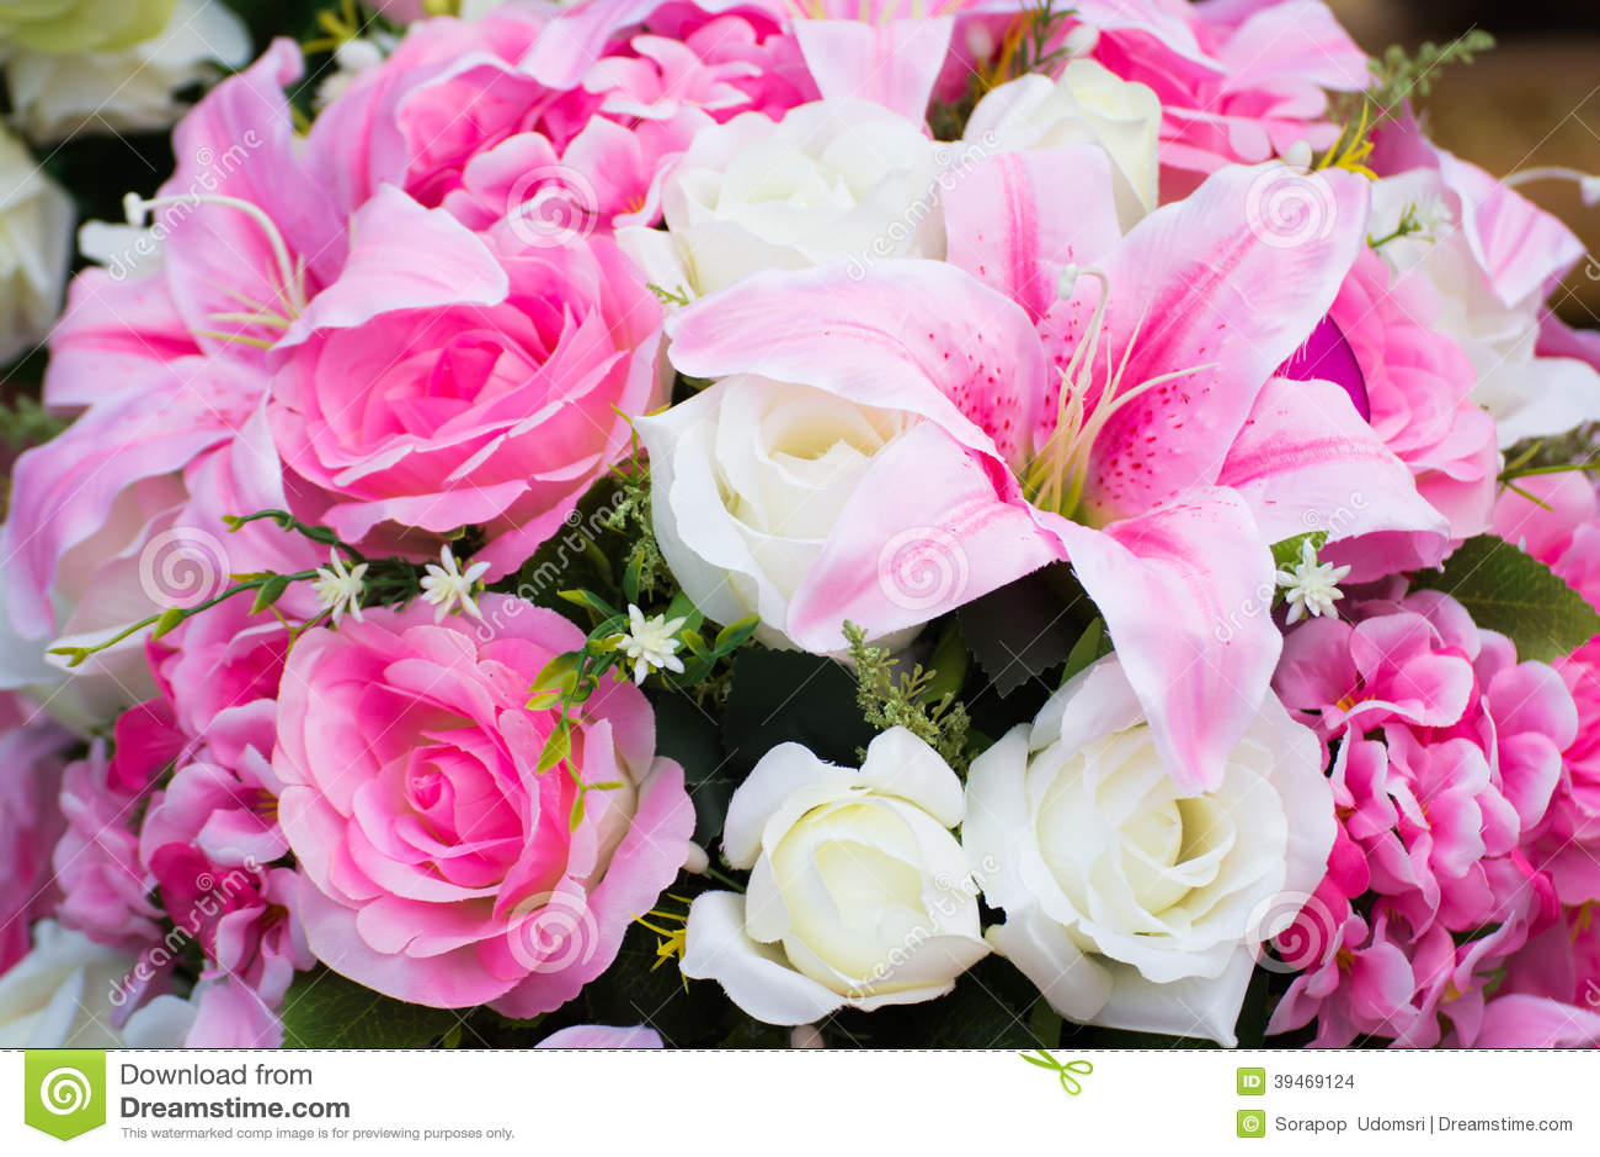 fausses fleurs photo stock - image: 39469124